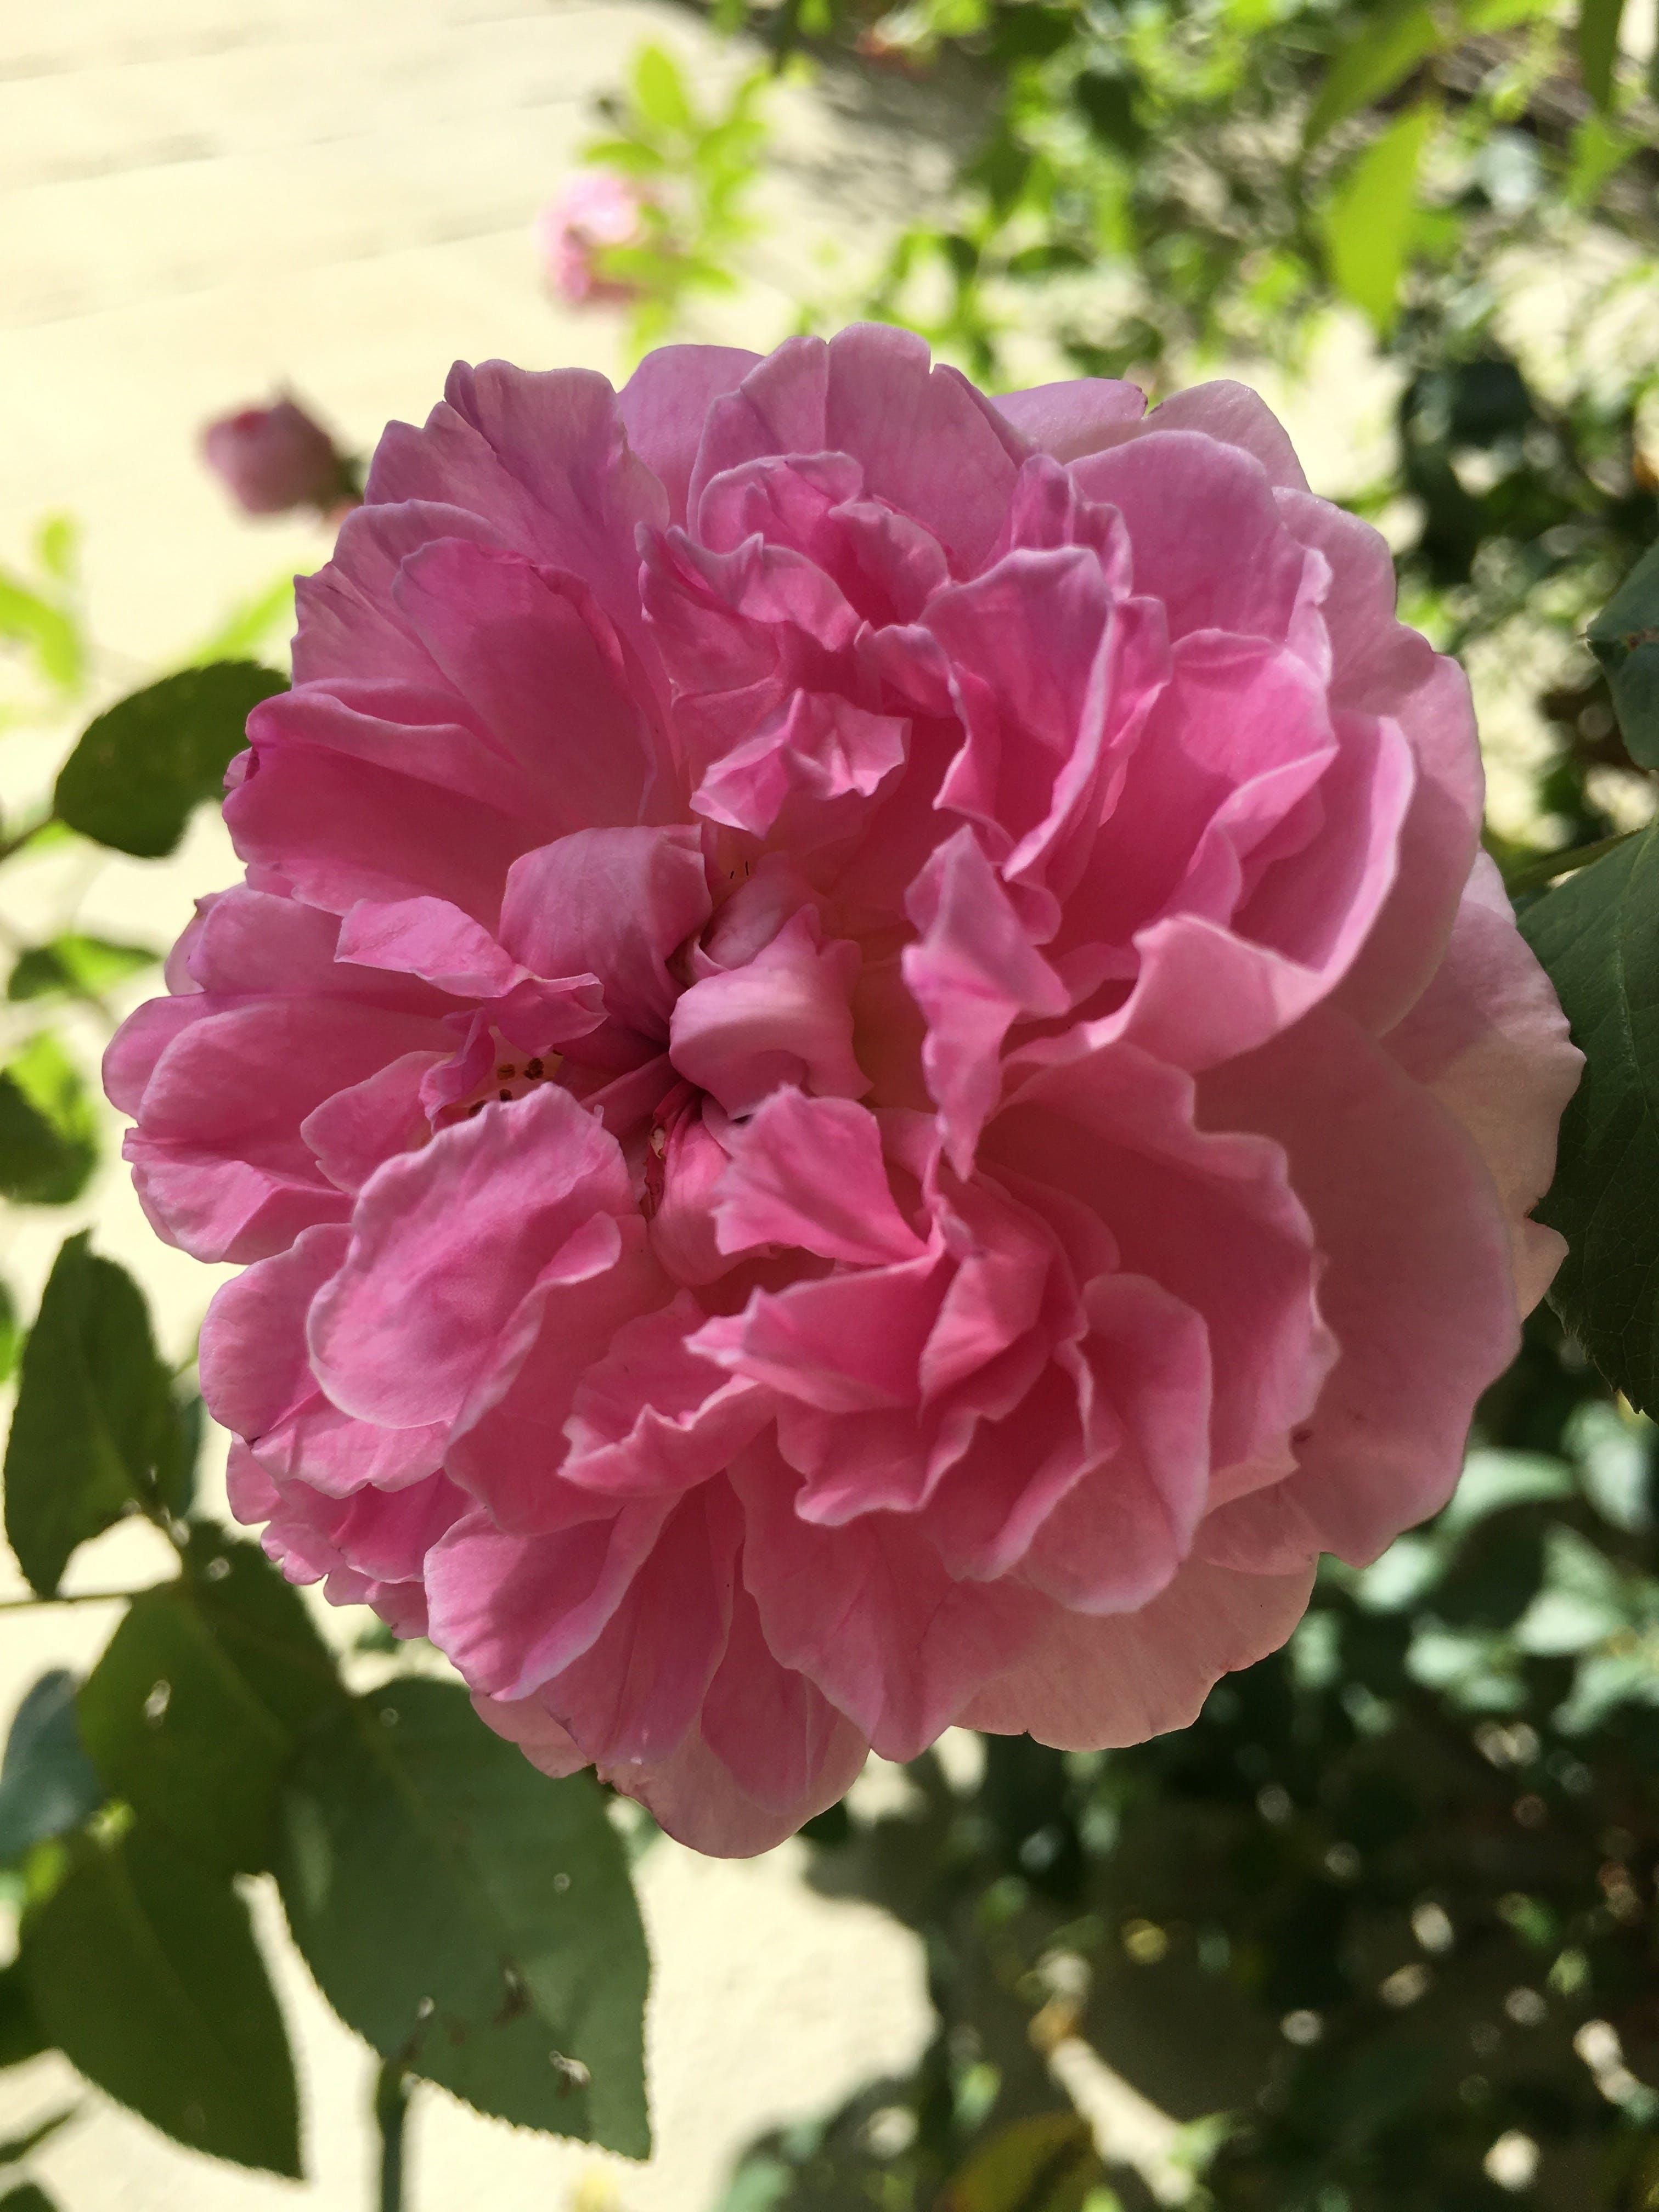 Free stock photo of spring, flower, Pink Rose, green foliage